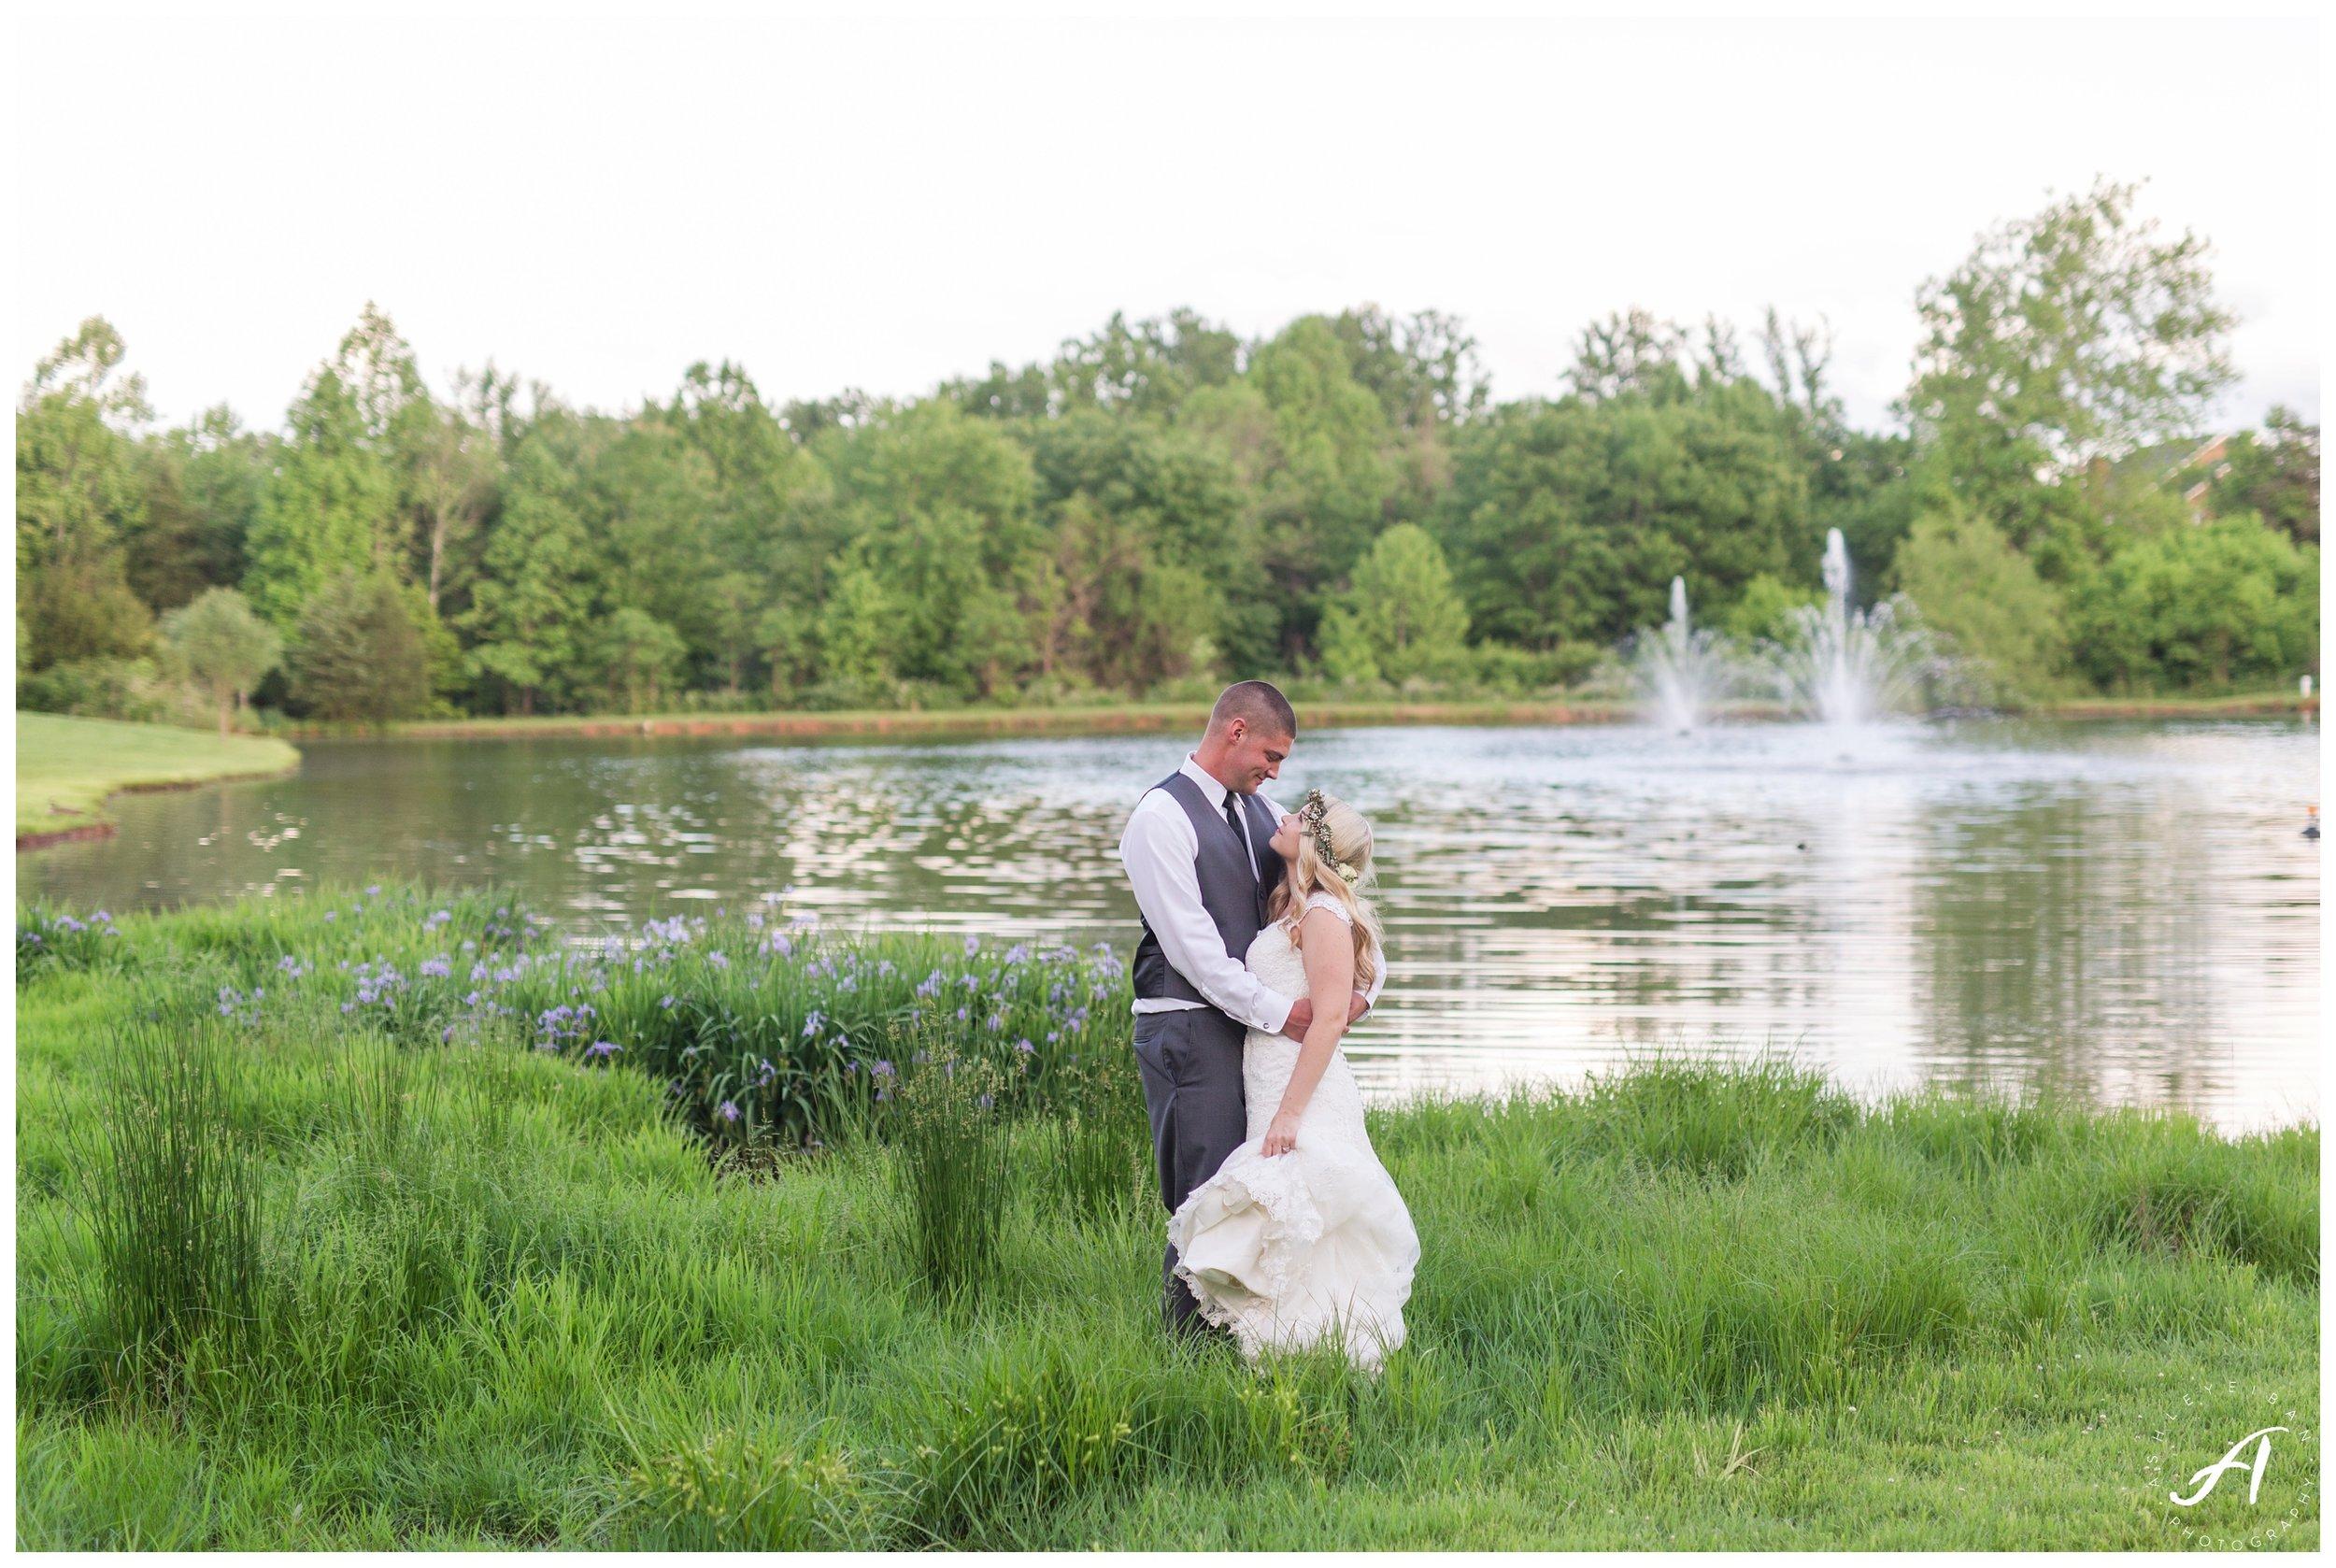 Charlottesville and Lynchburg Virginia Wedding and Engagement Photographer || Ashley Eiban Photography || www.ashleyeiban.com